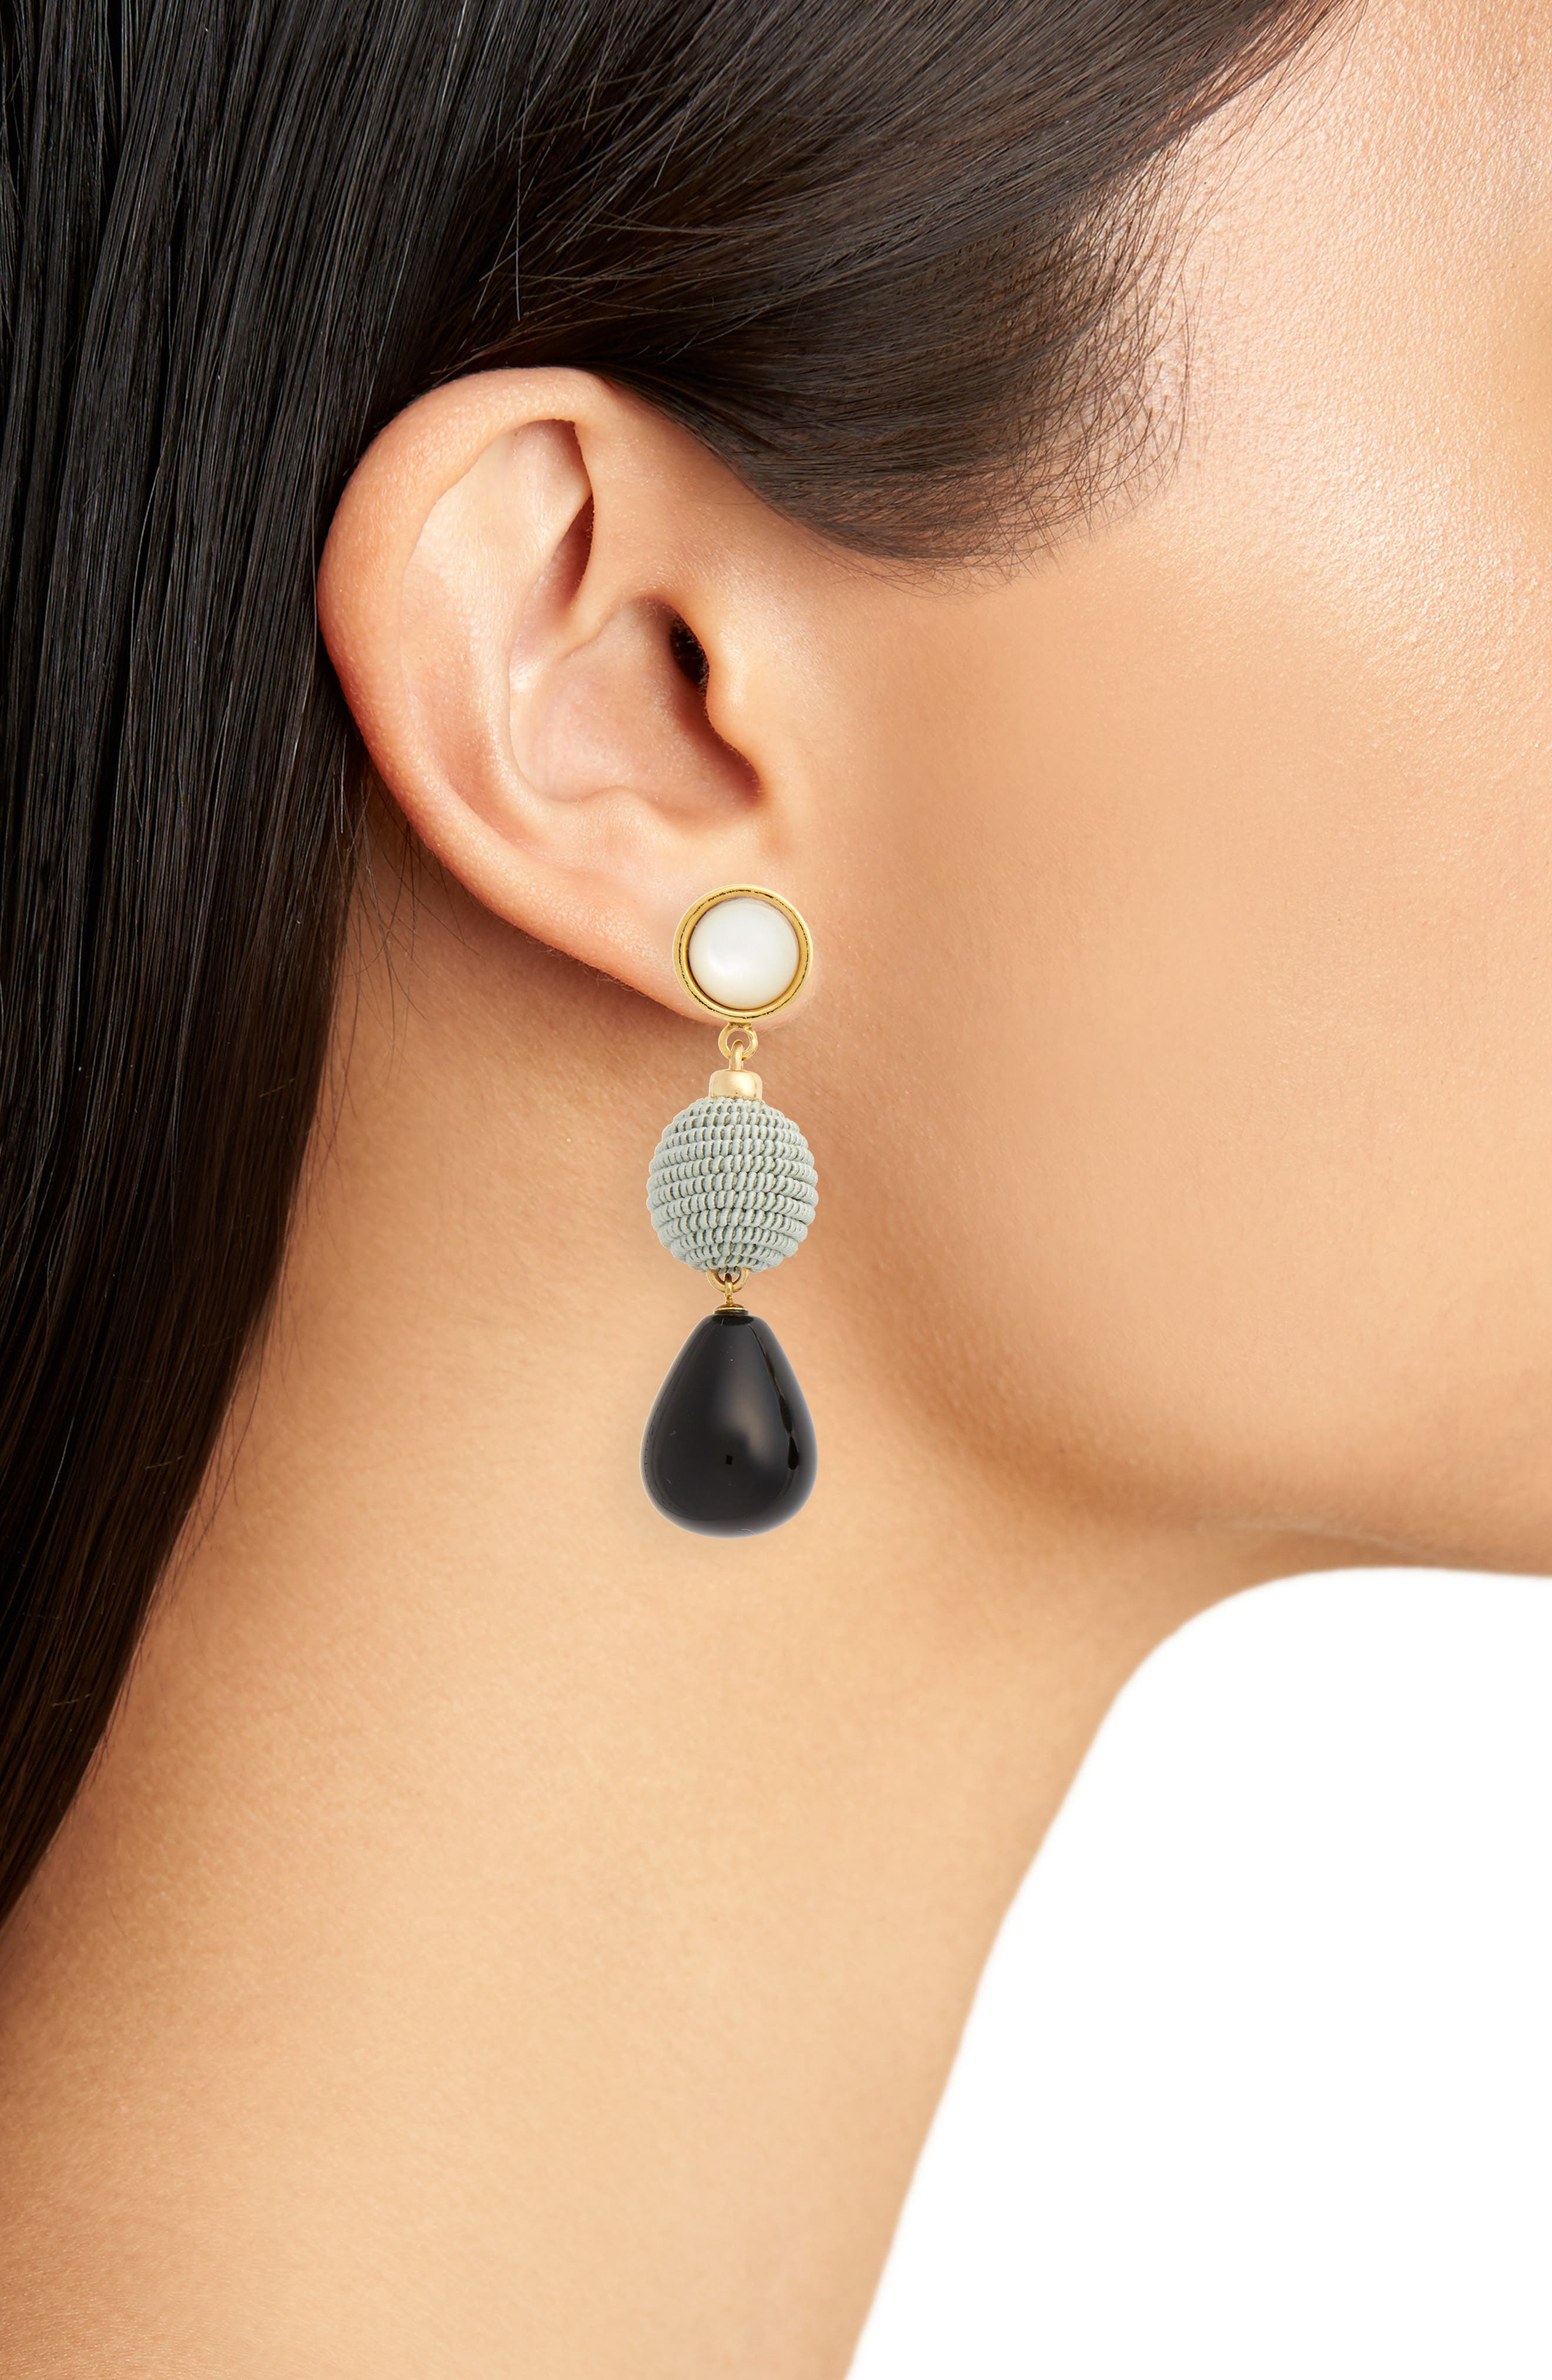 Agate Drop Earrings,                             Alternate thumbnail 2, color,                             Black